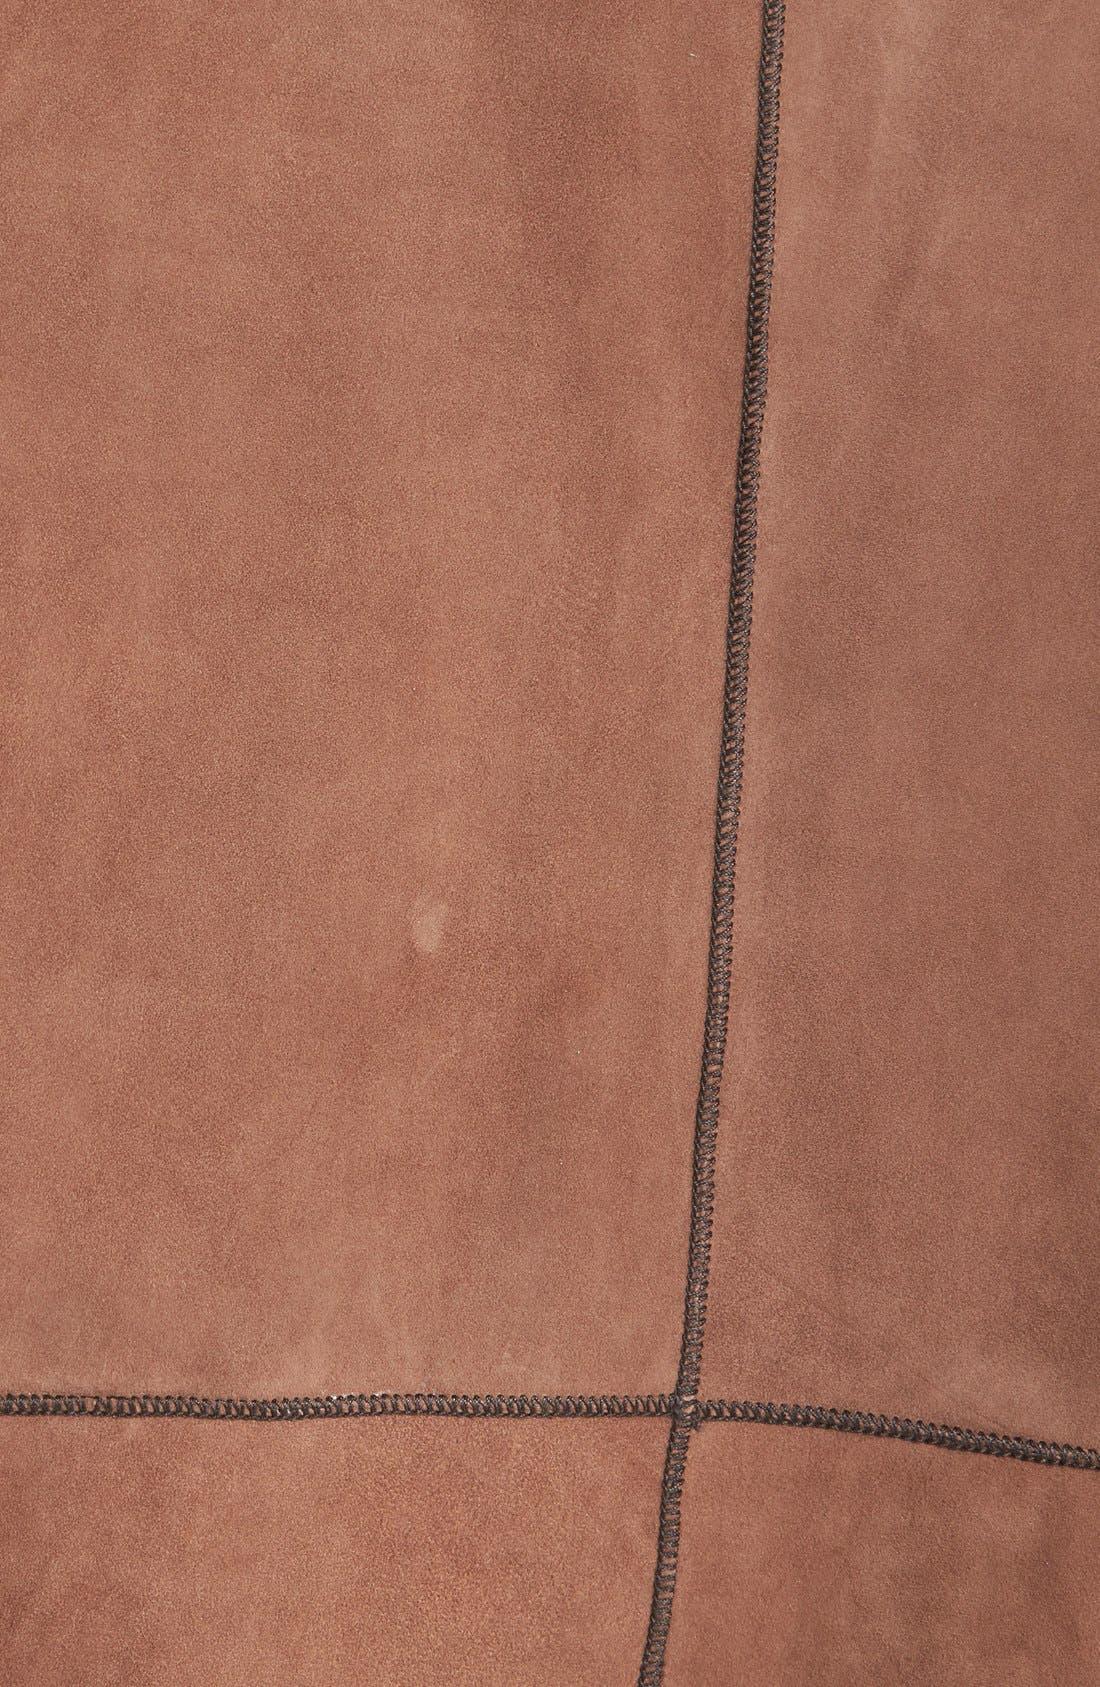 Reversible Suede Jacket,                             Alternate thumbnail 3, color,                             Chocolate